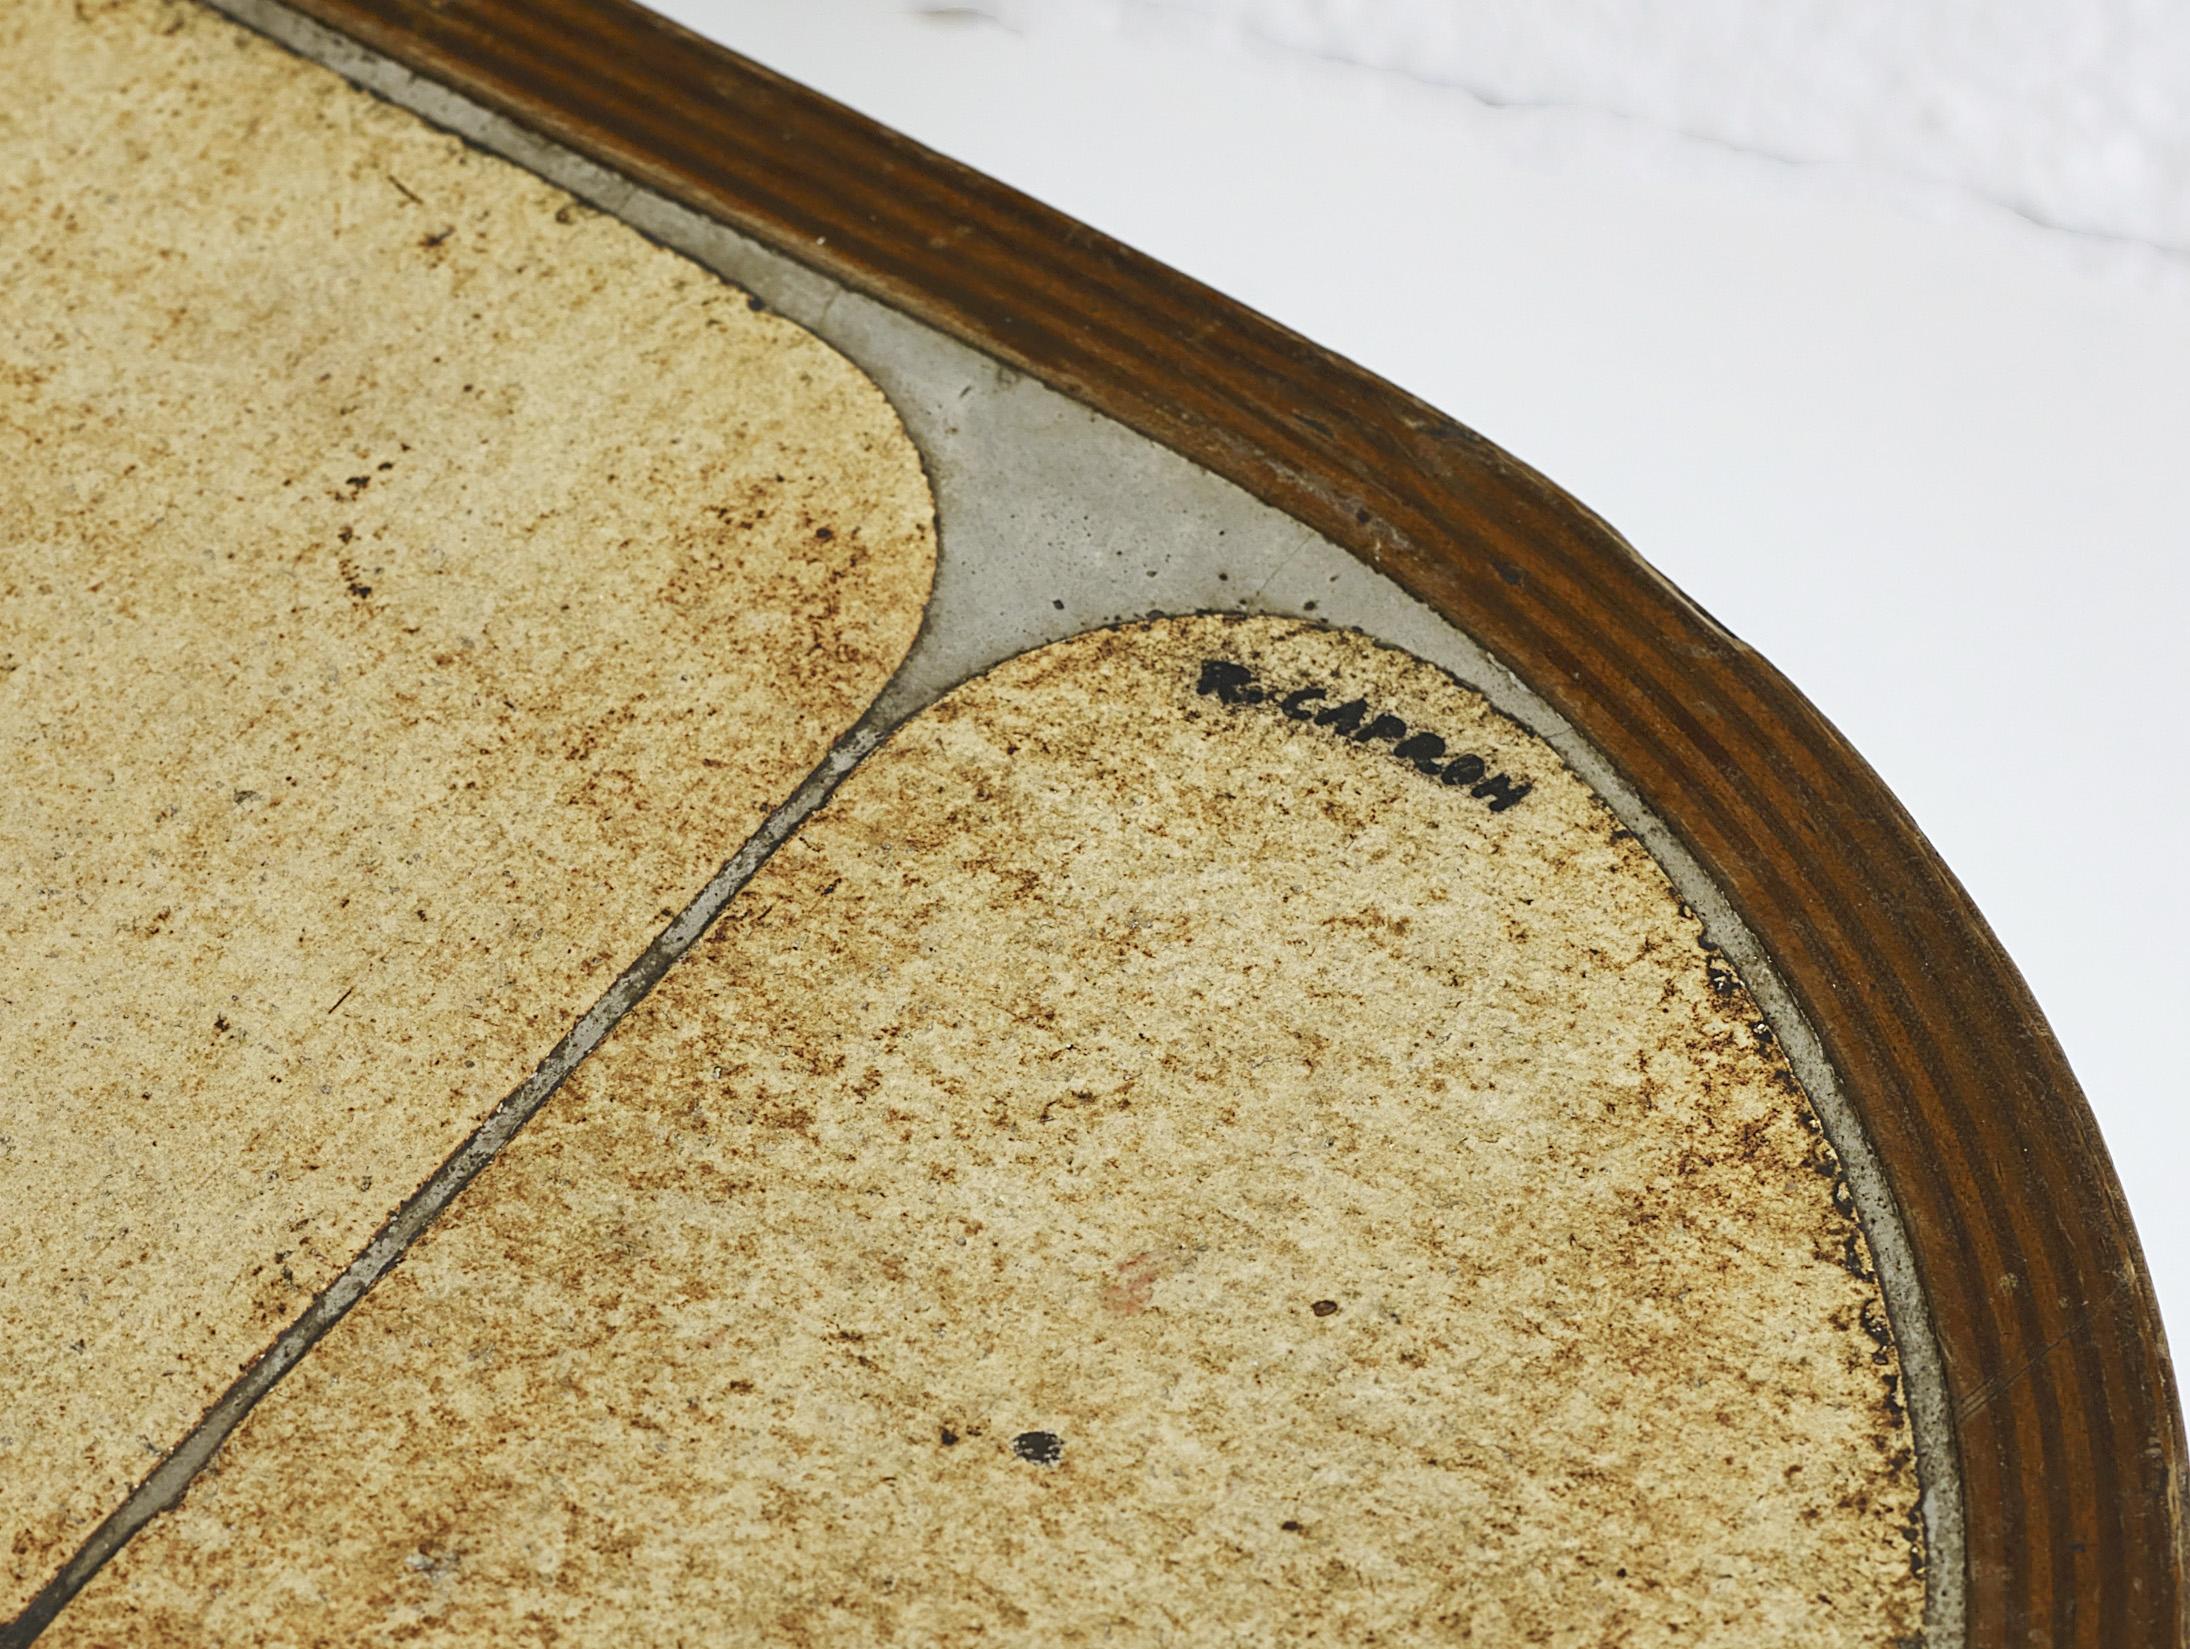 table-basse-shogun-de-roger-capron-image-02